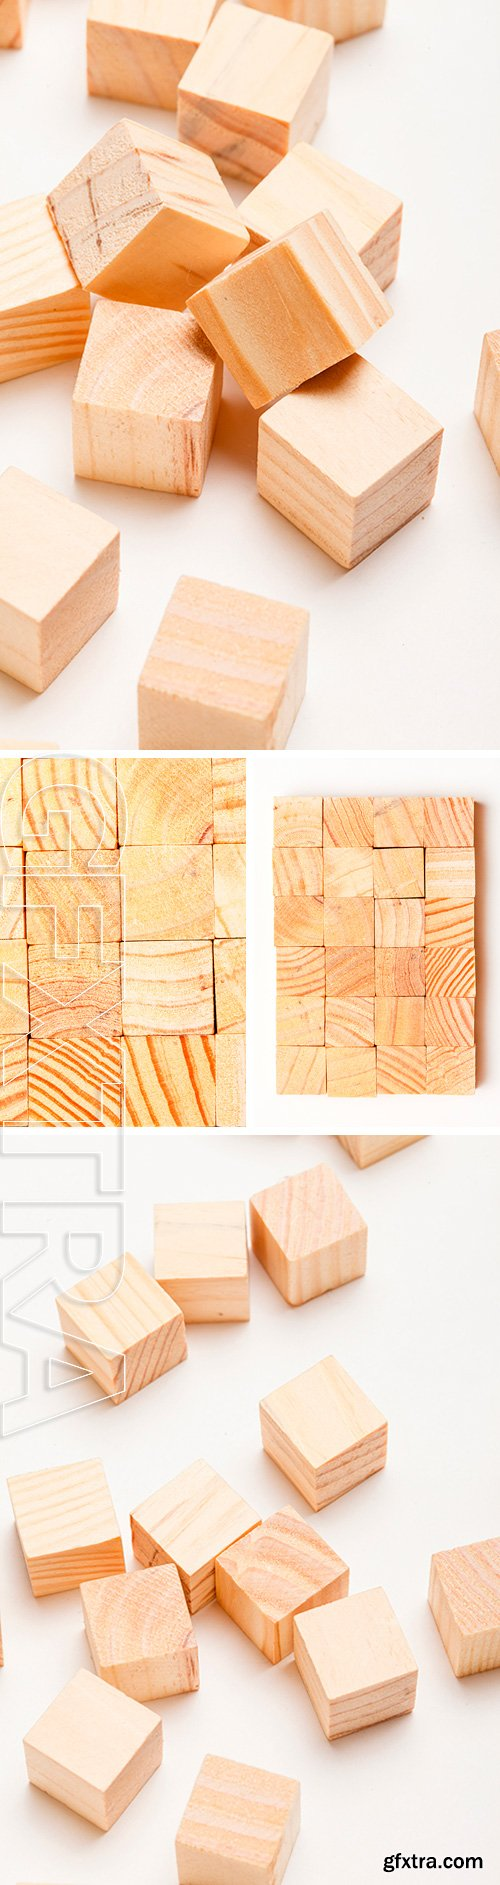 Stock Photos - Wooden toy blocks